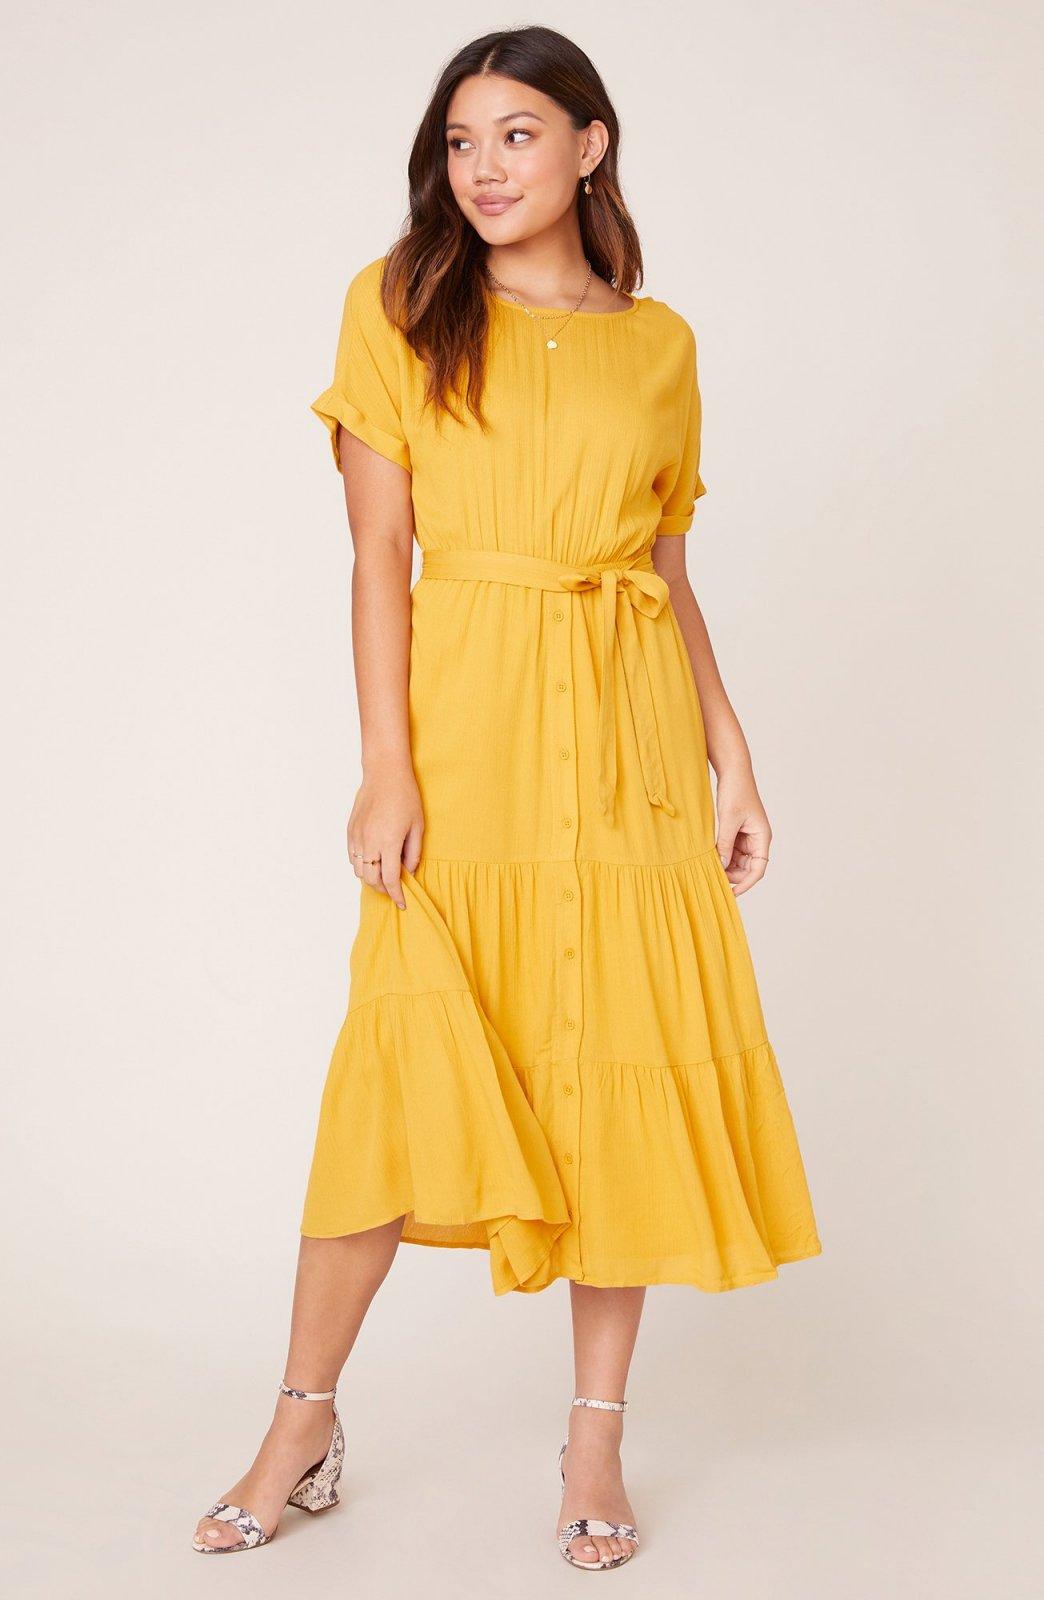 BB Dakota Mustard Yellow Dress